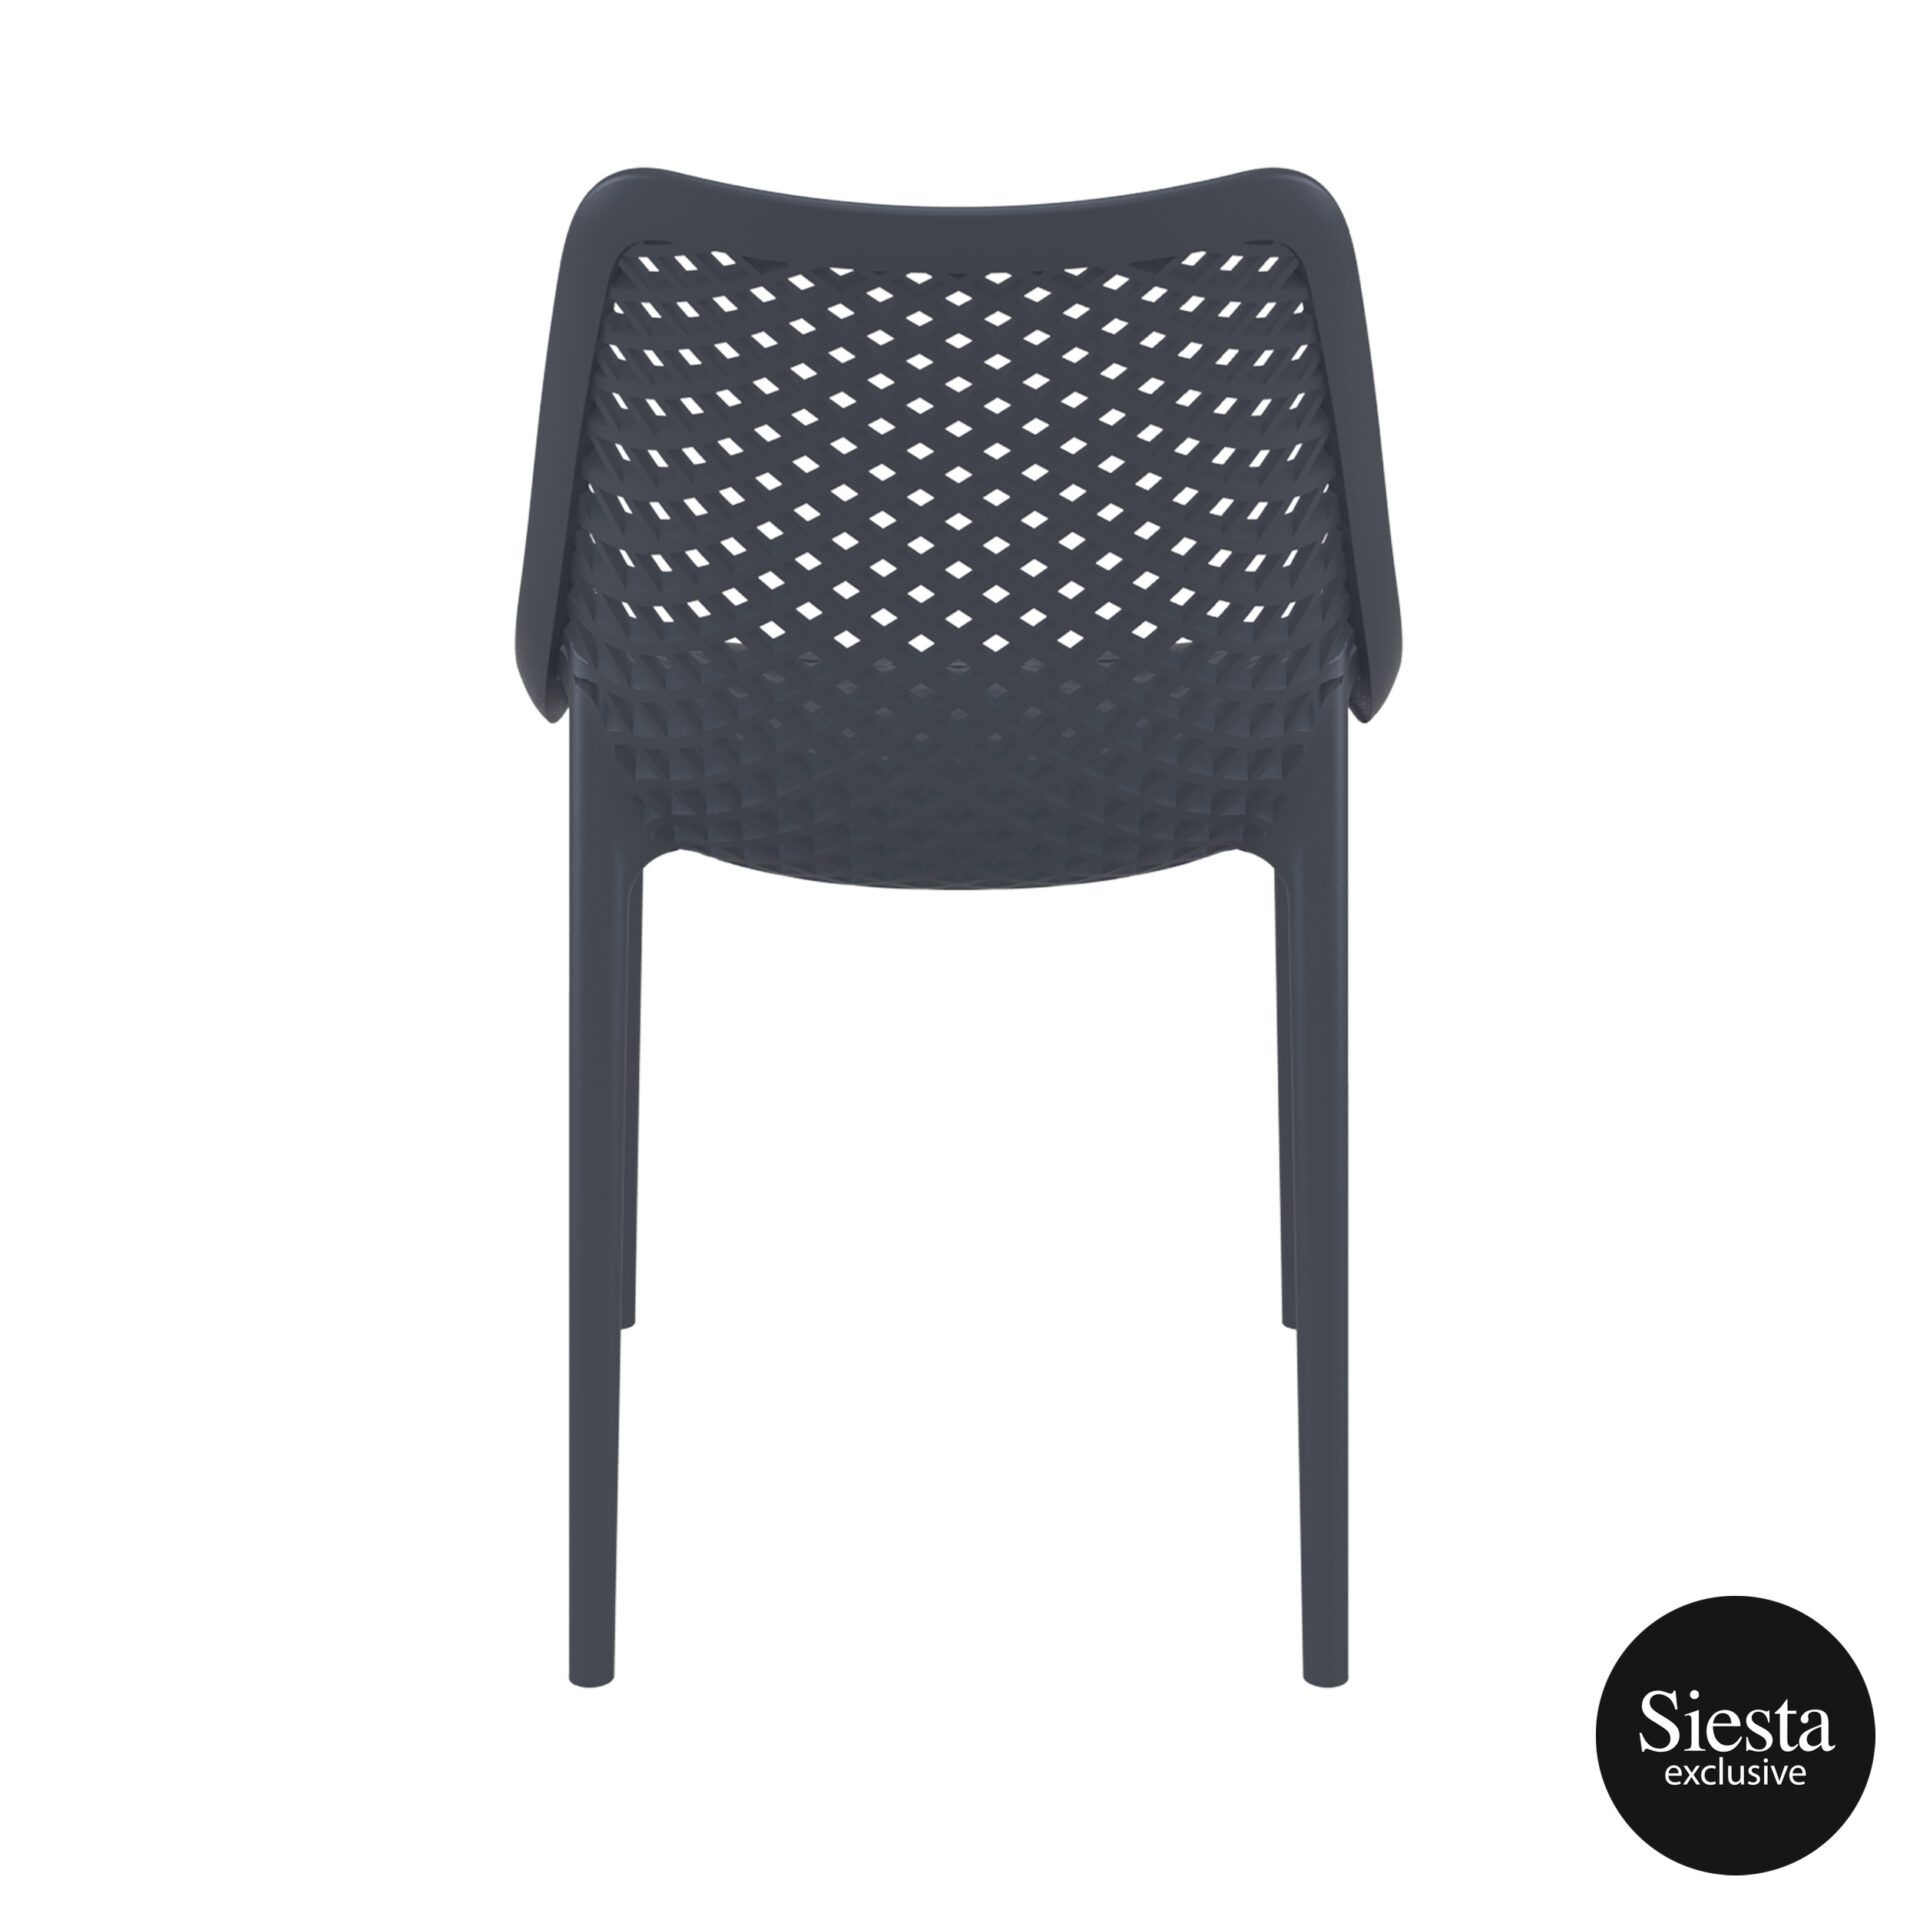 original siesta air chair darkgrey back 1